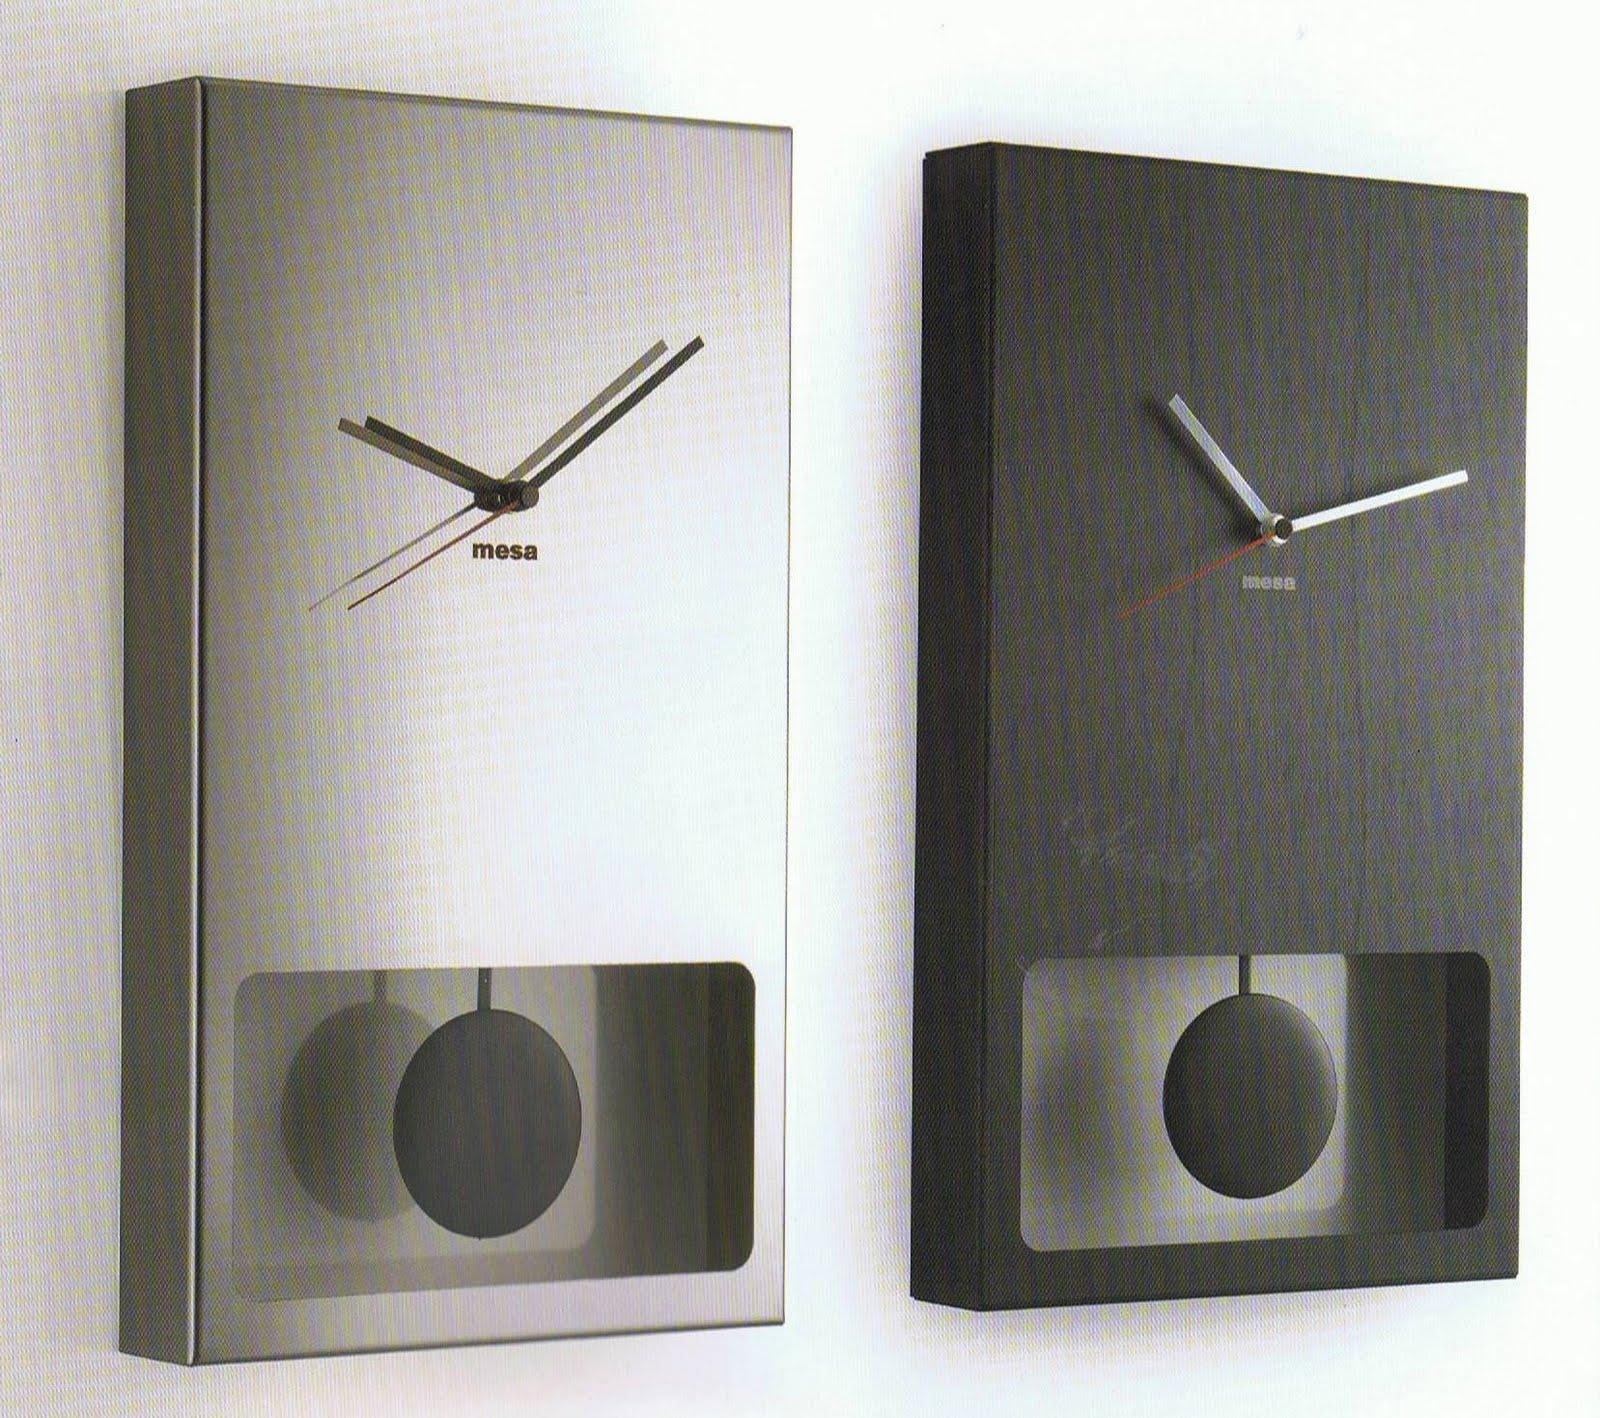 Orologi da parete moderni 408inc blog - Orologi da parete moderni ...